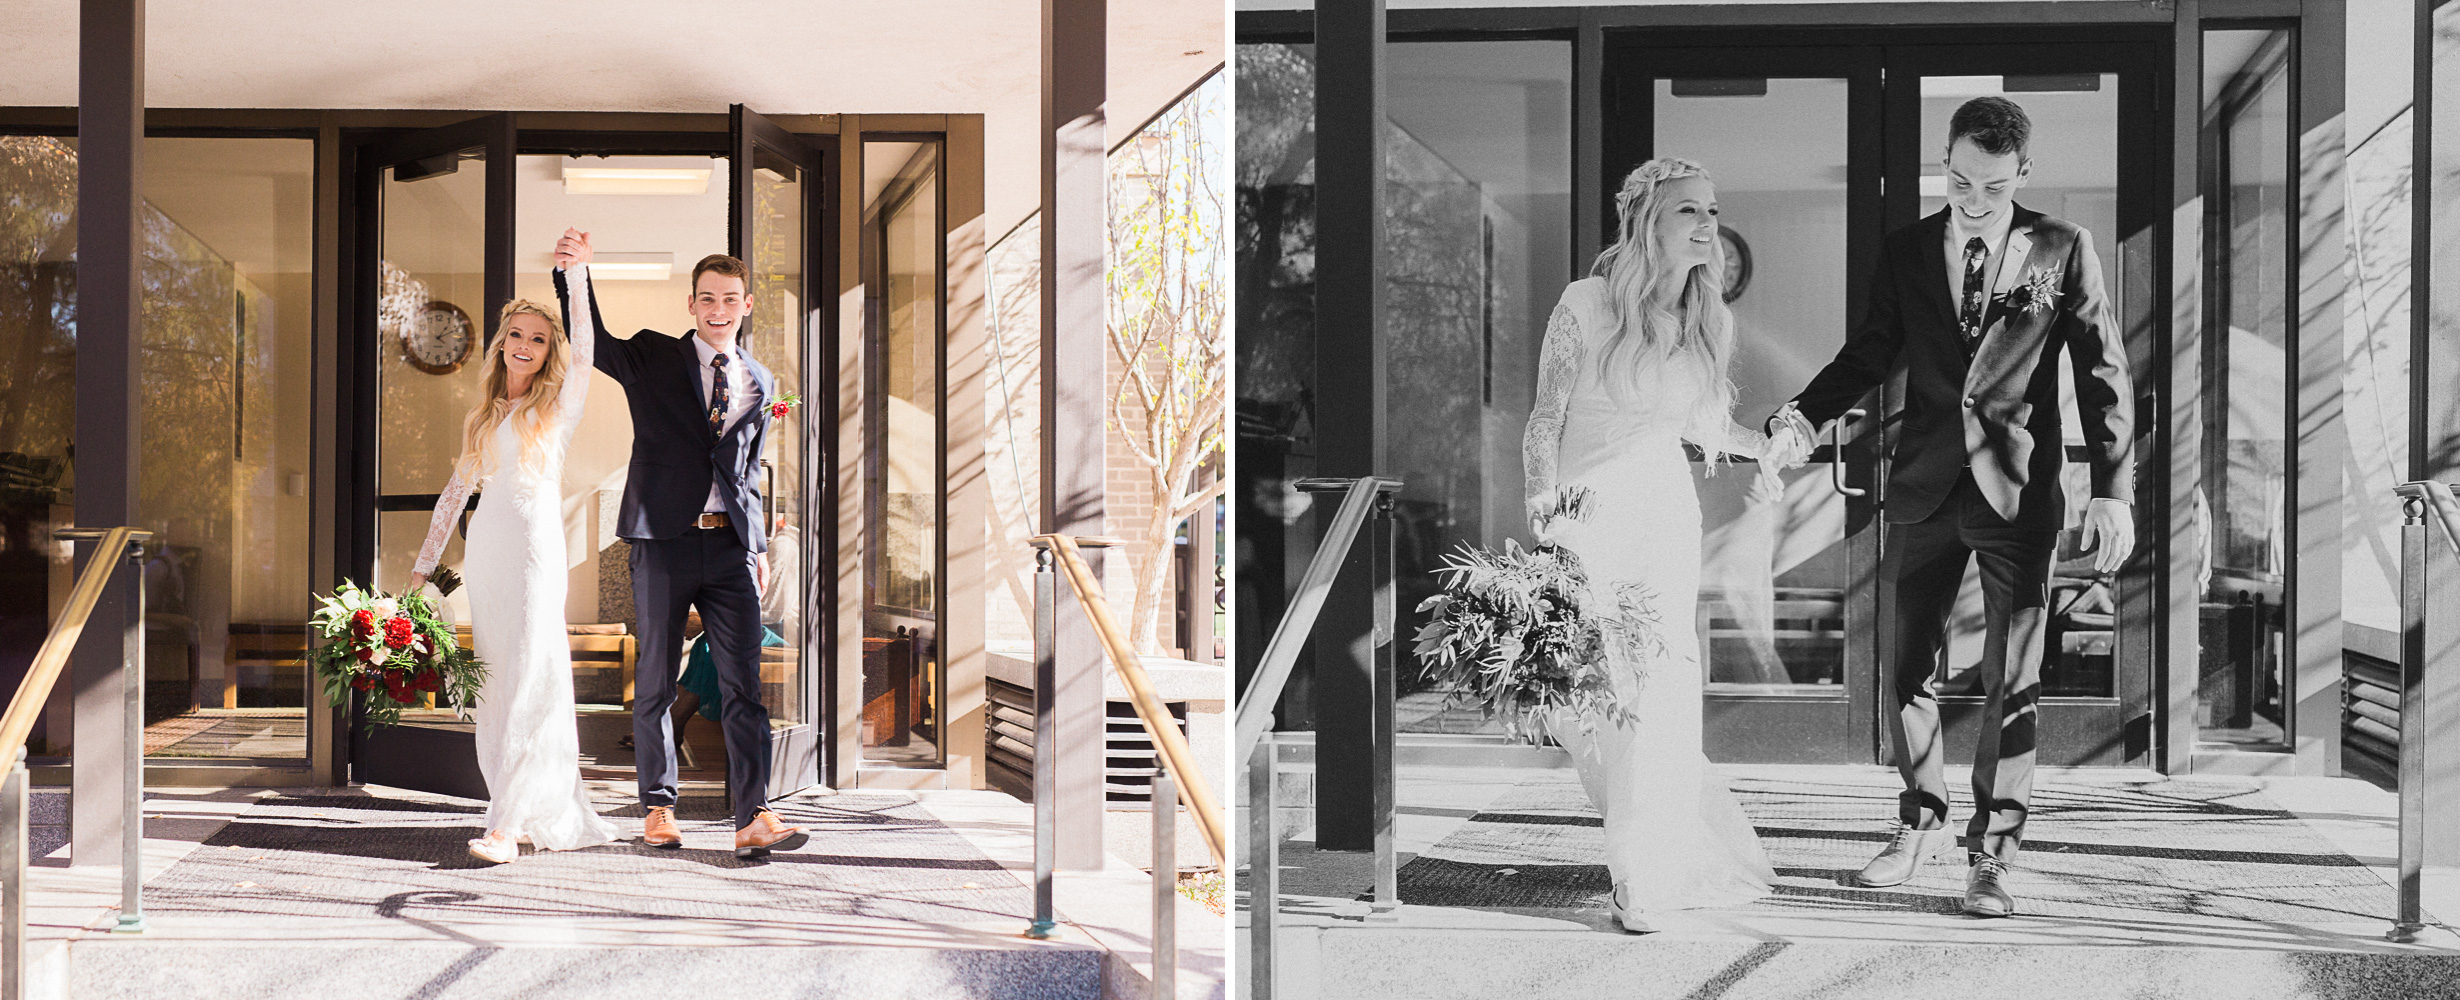 Salt-Lake-City-Temple-Wedding-Photographer-011.jpg